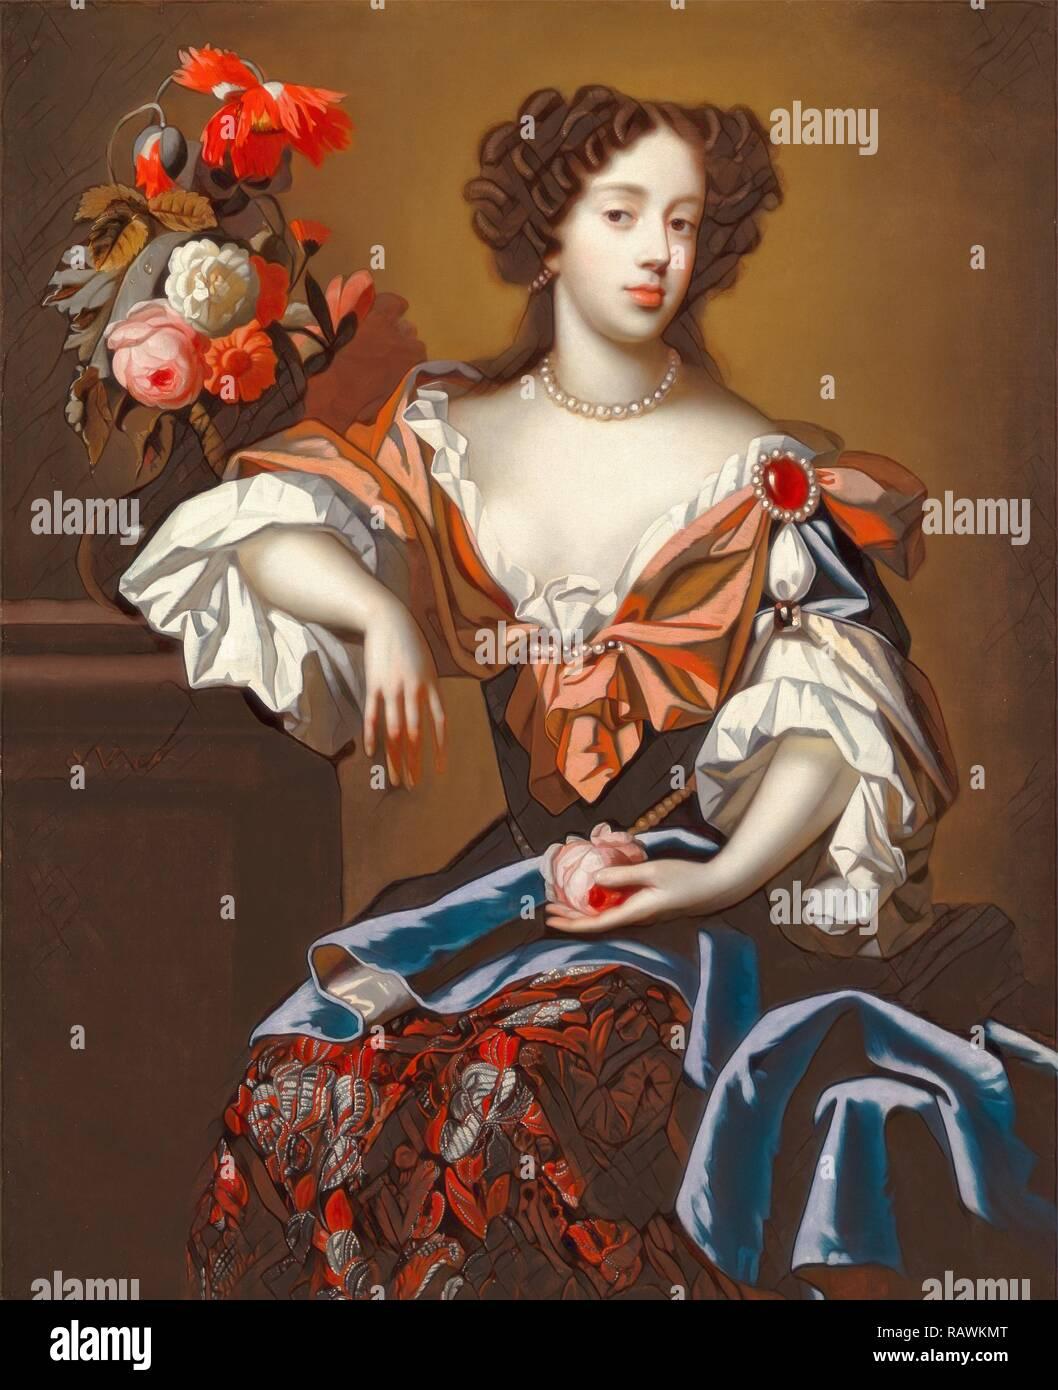 Mary Of Modena Signed Center Left S Ve J Monogram Simon Verelst 1644 1710 Dutch Reimagined Stock Photo Alamy